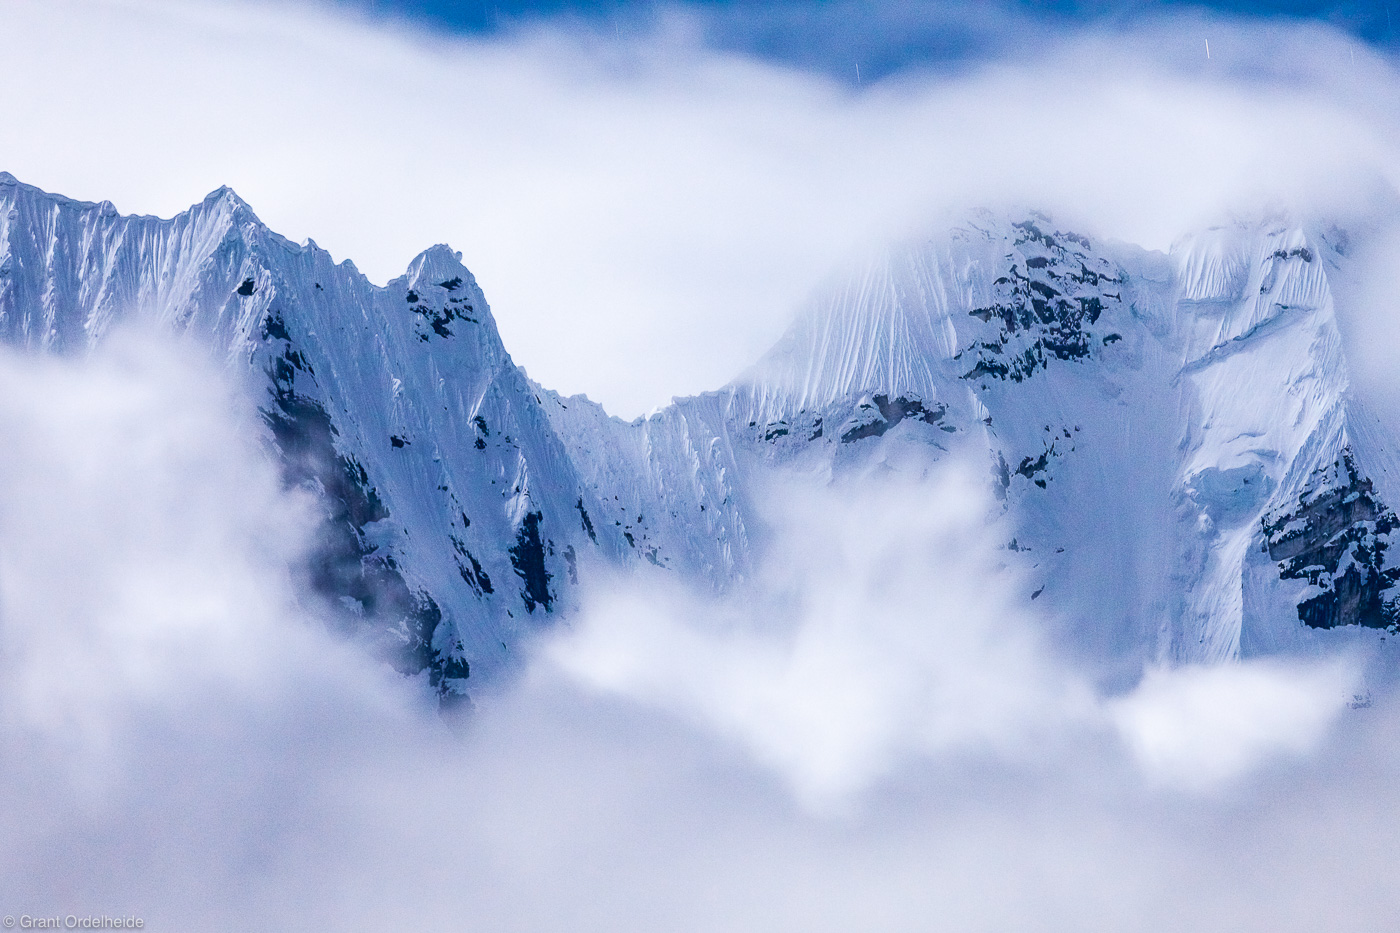 monsoon, mountains, cordillera, huayhuash, huaraz, peru, rugged, ridge, clouds, night, photo